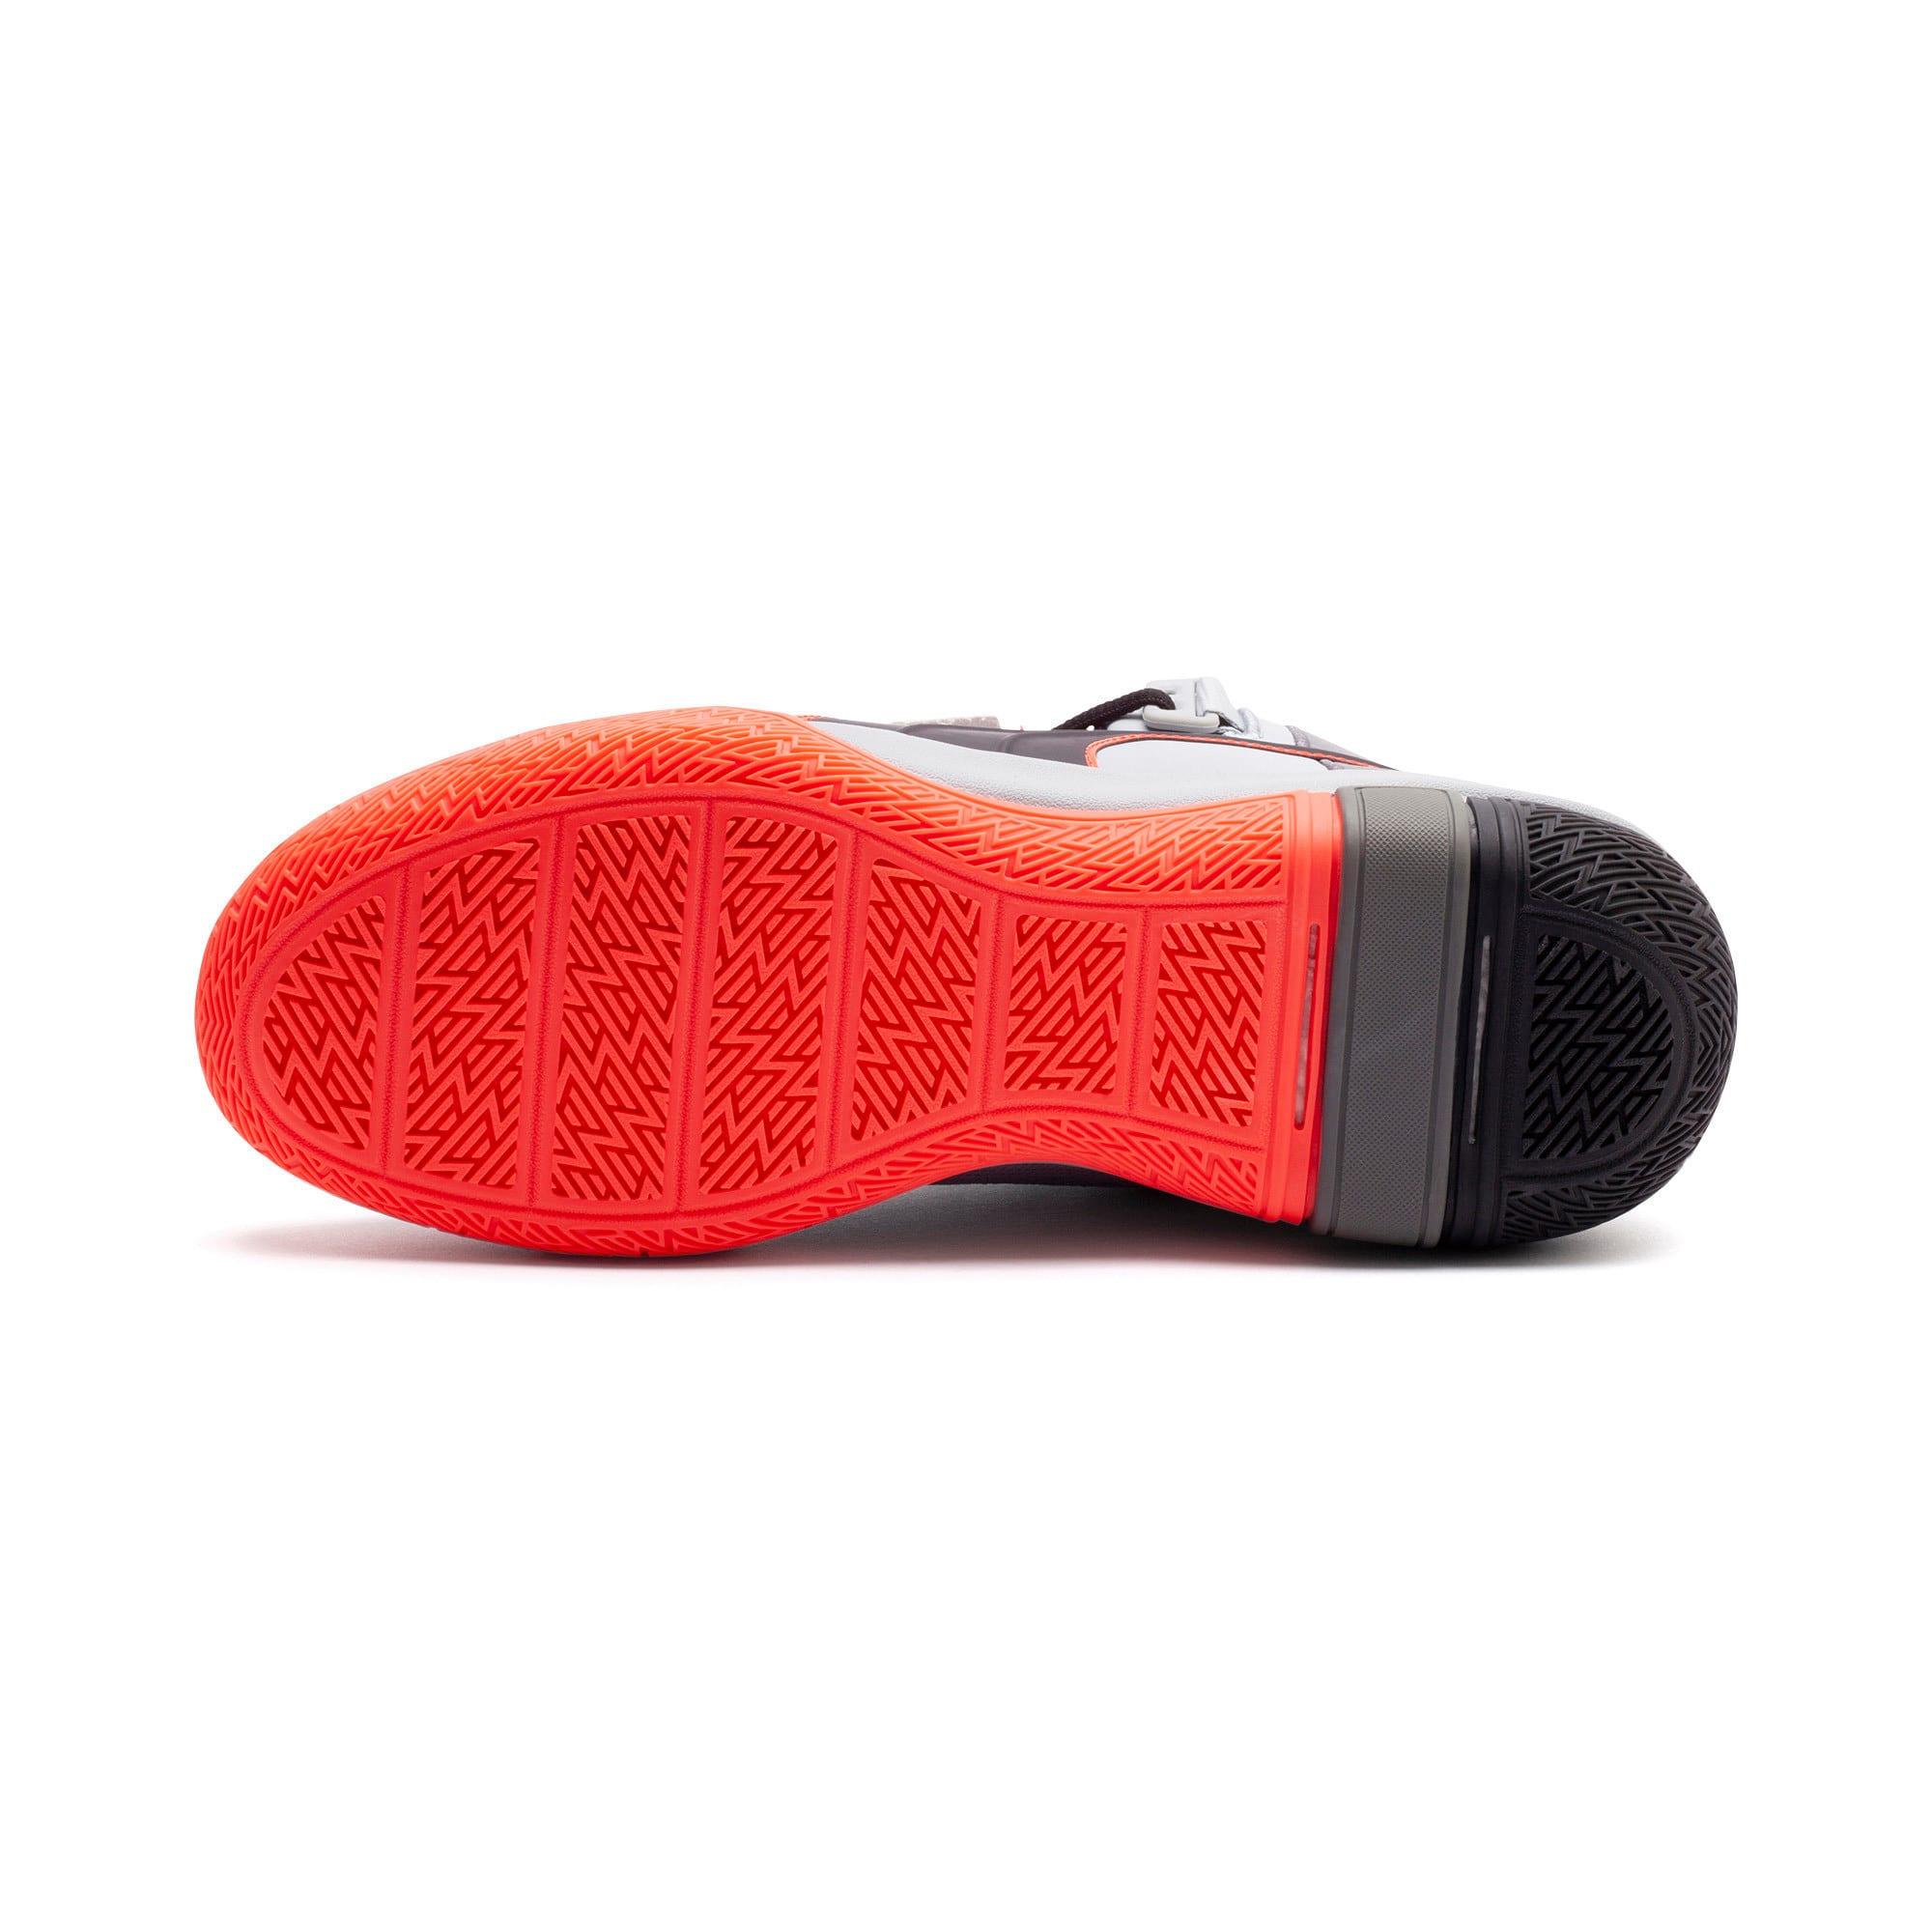 Thumbnail 4 of Legacy Disrupt Men's Basketball Shoes, Puma Black-Red Blast, medium